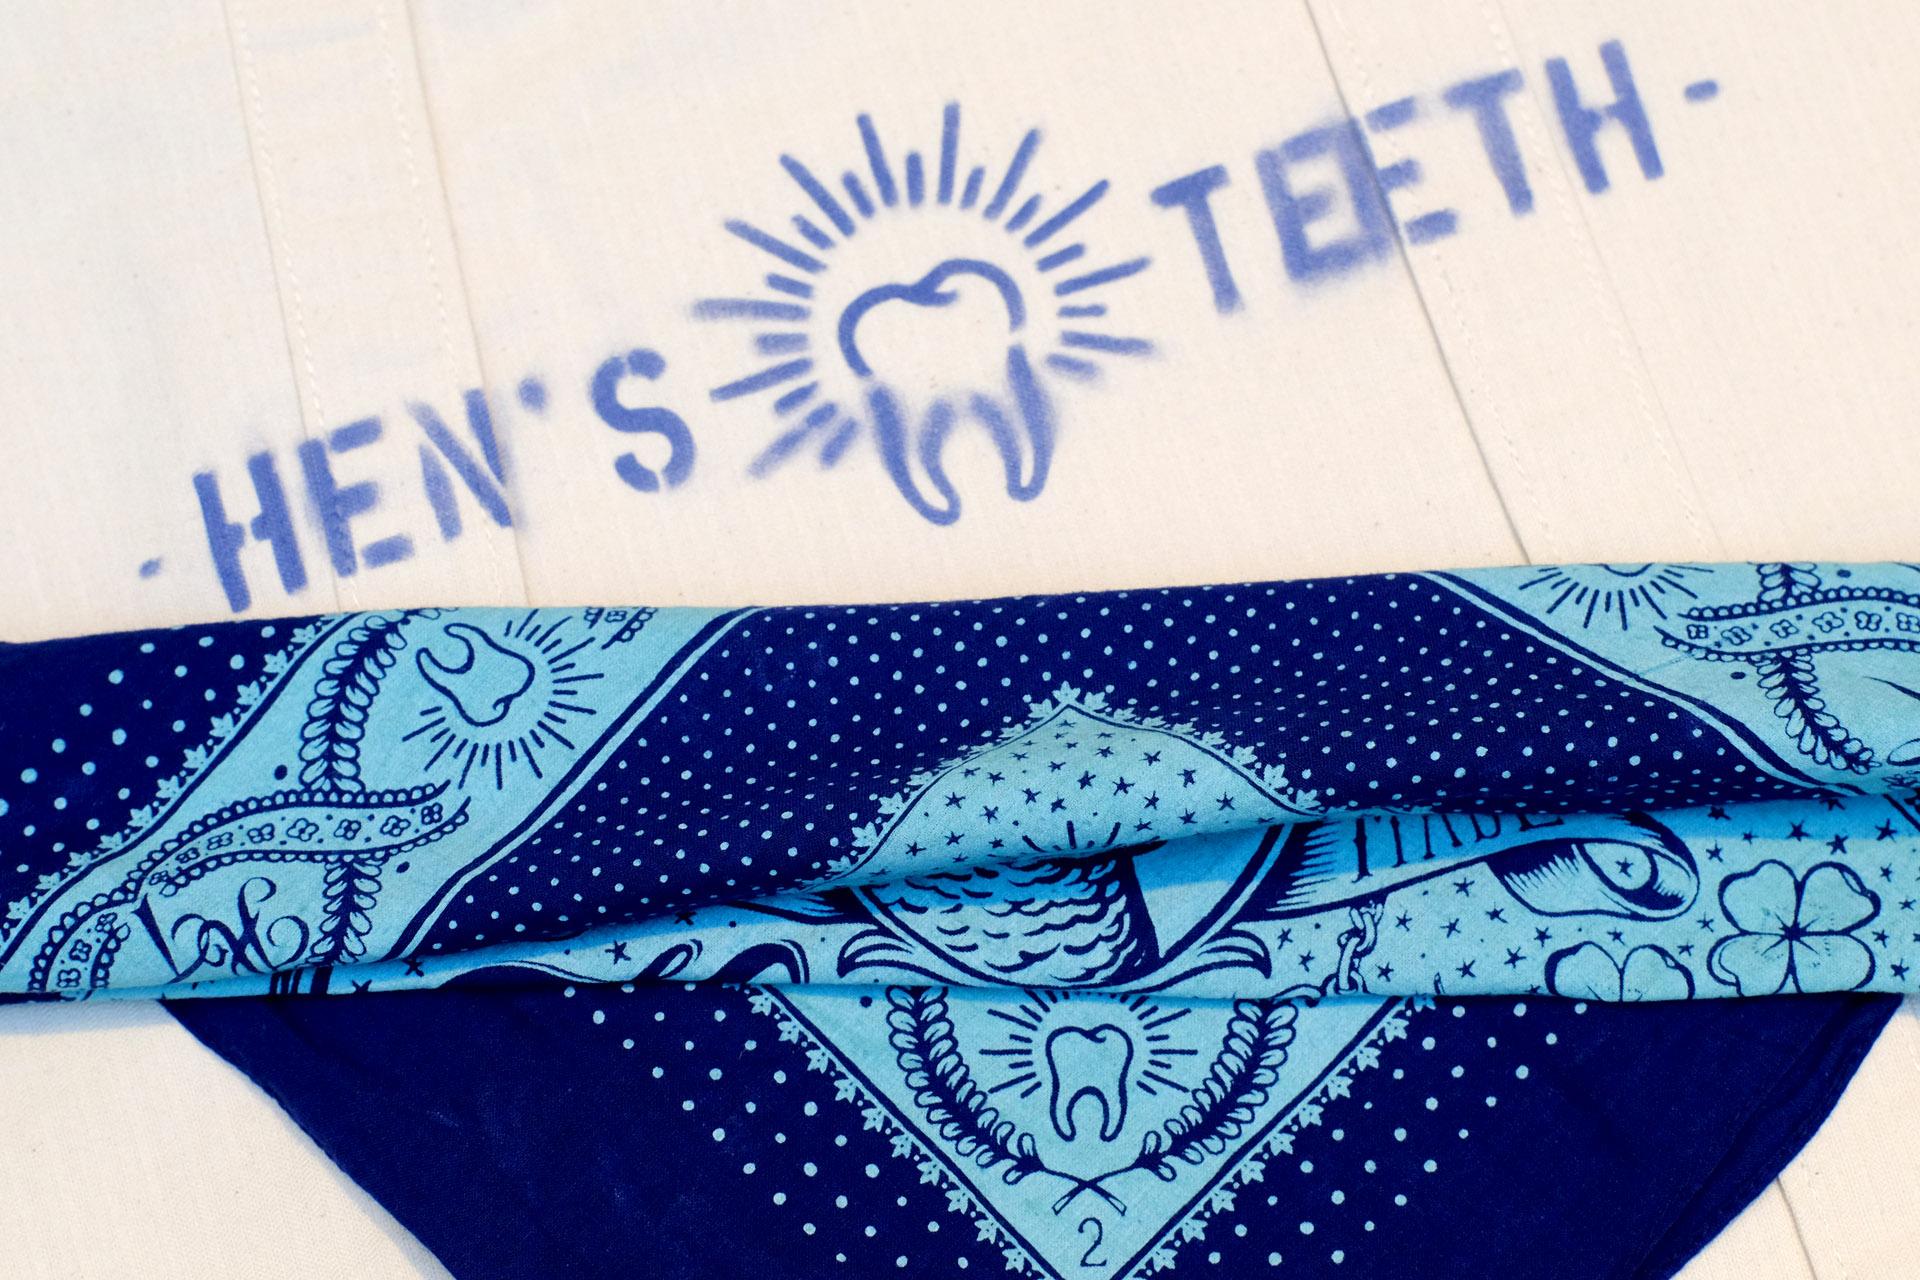 hens-teeth-bandana-stofftasche